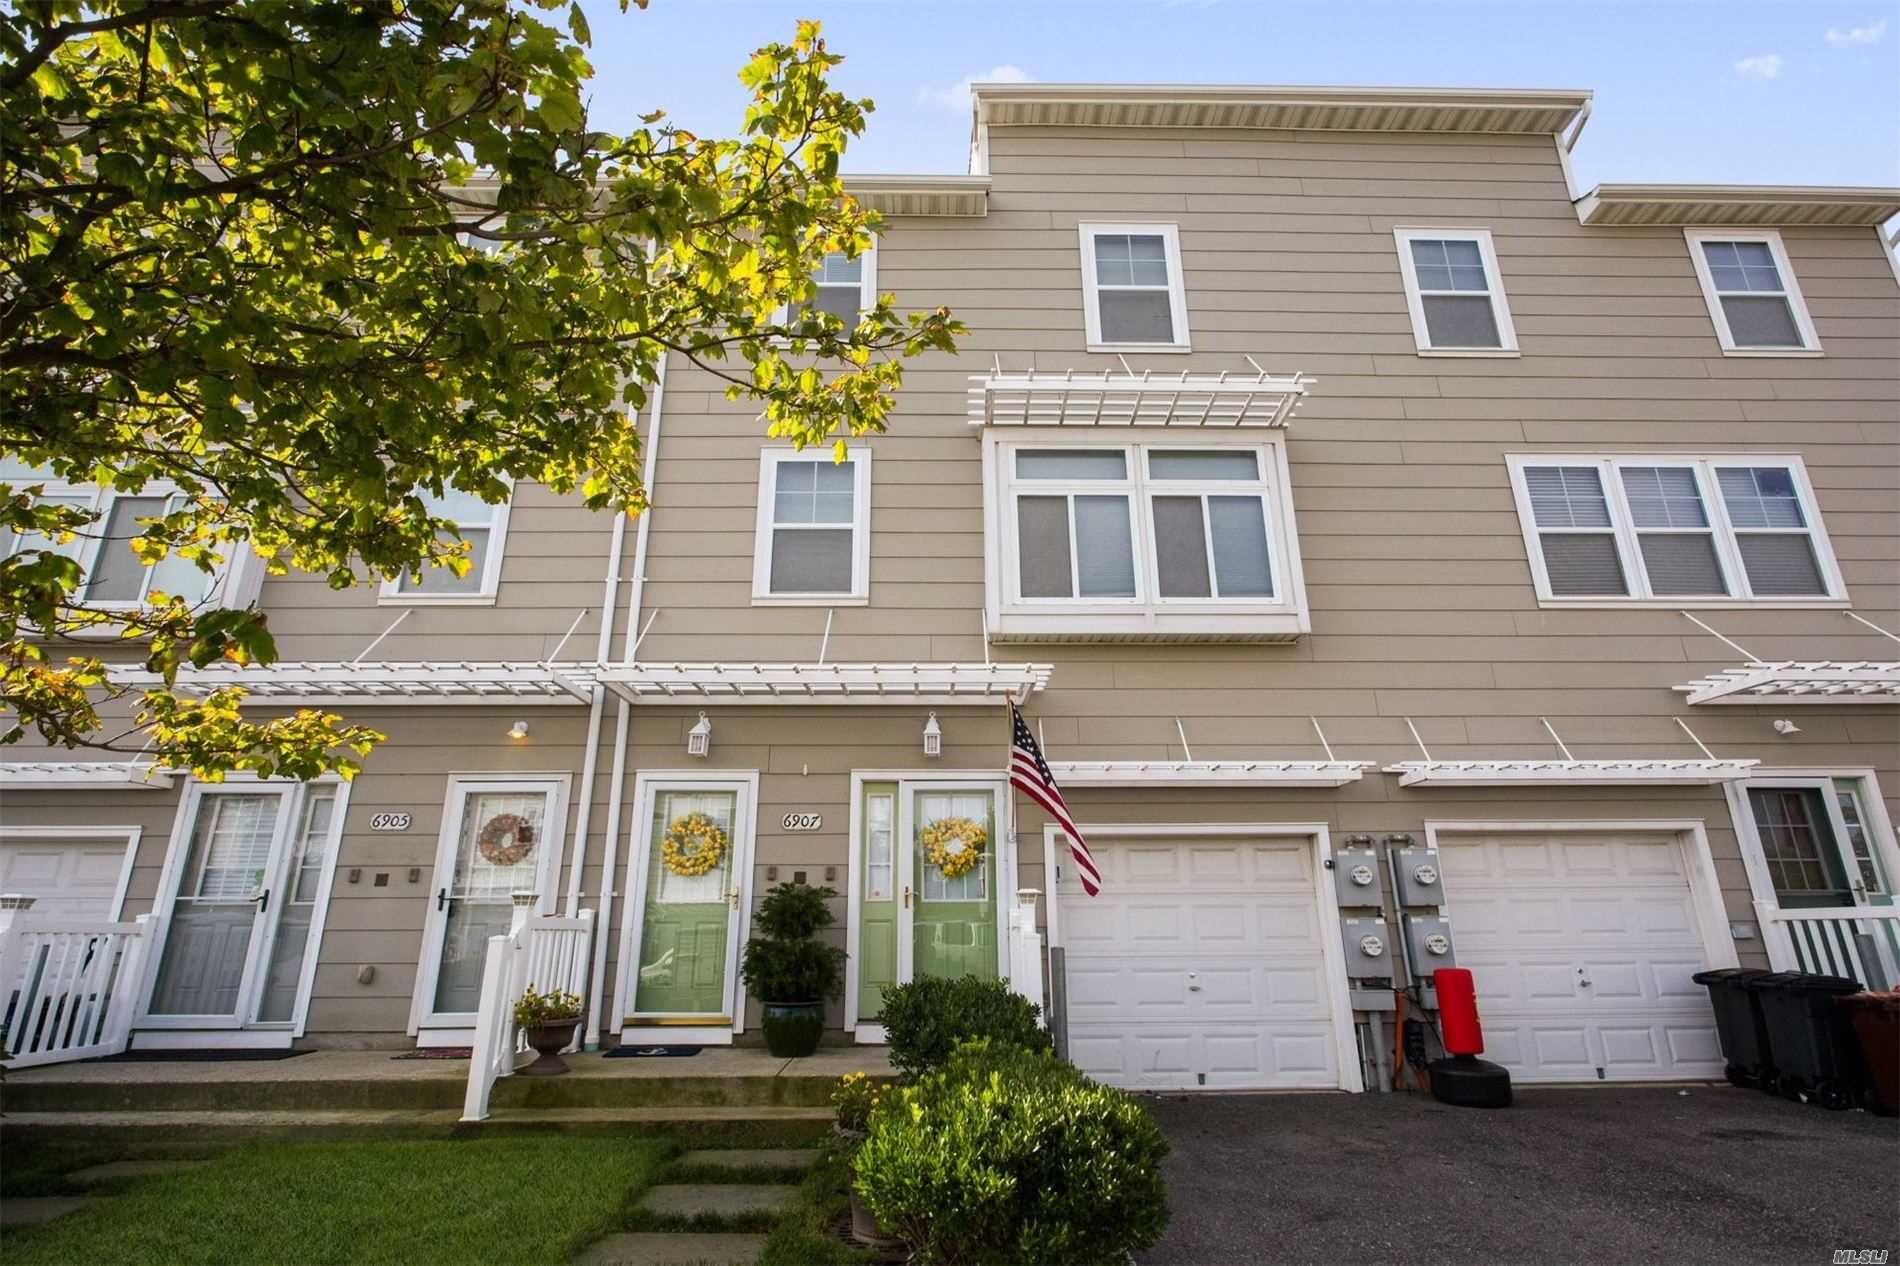 Property for sale at 69-07 Coral Reef Way, Arverne NY 11692, Arverne,  New York 11692